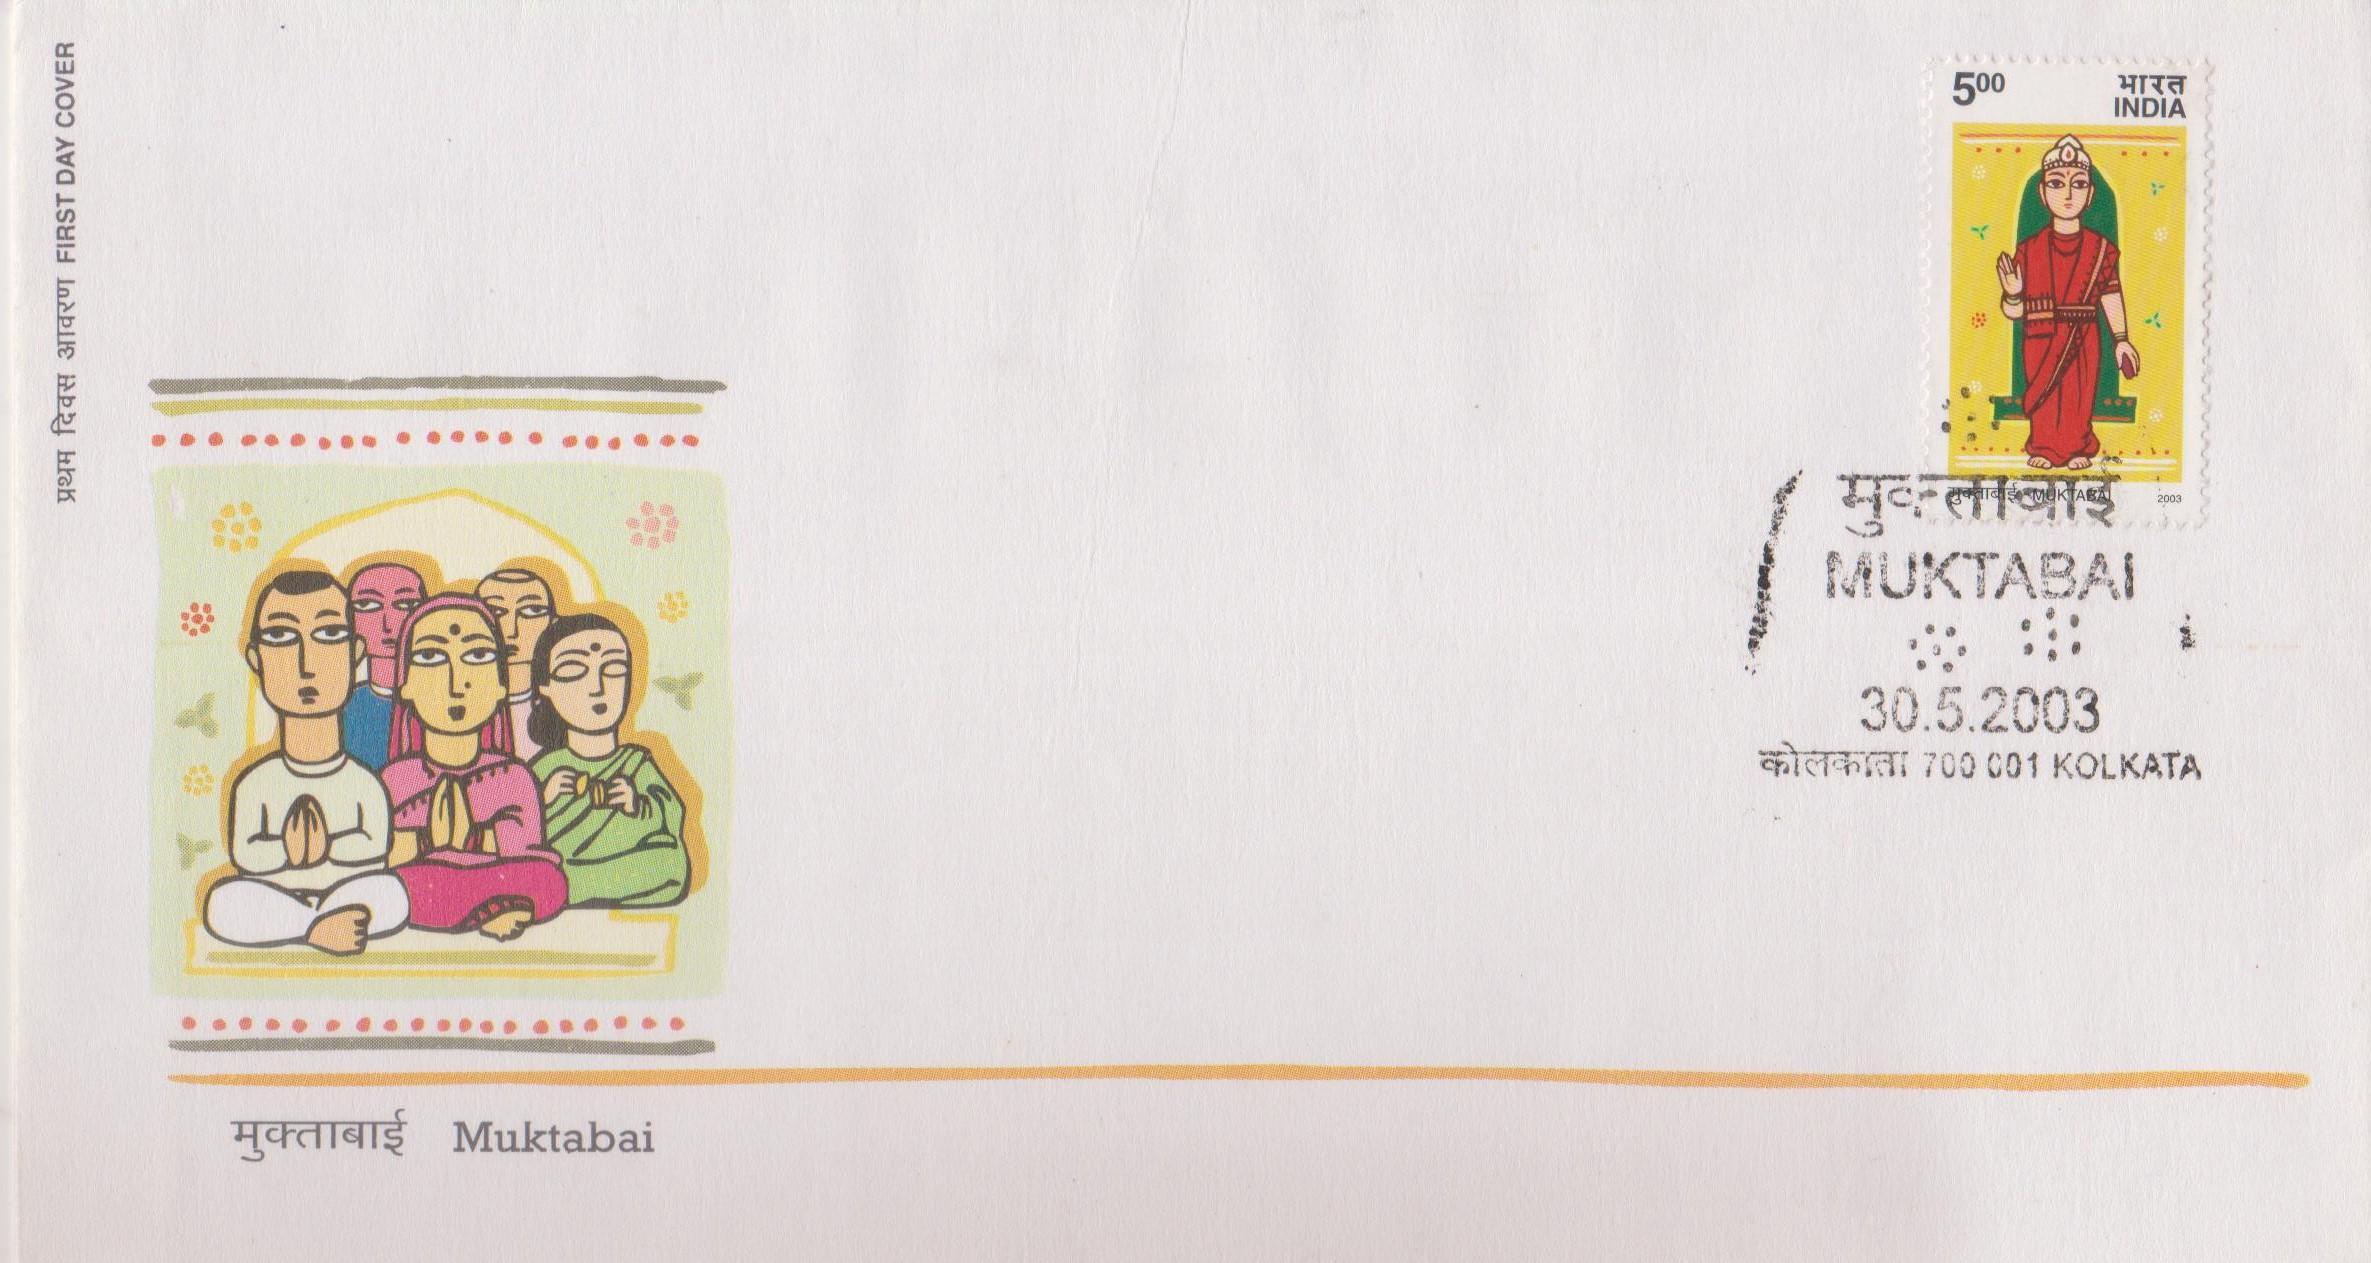 Abhanga : Tati ughada dnaneshwara